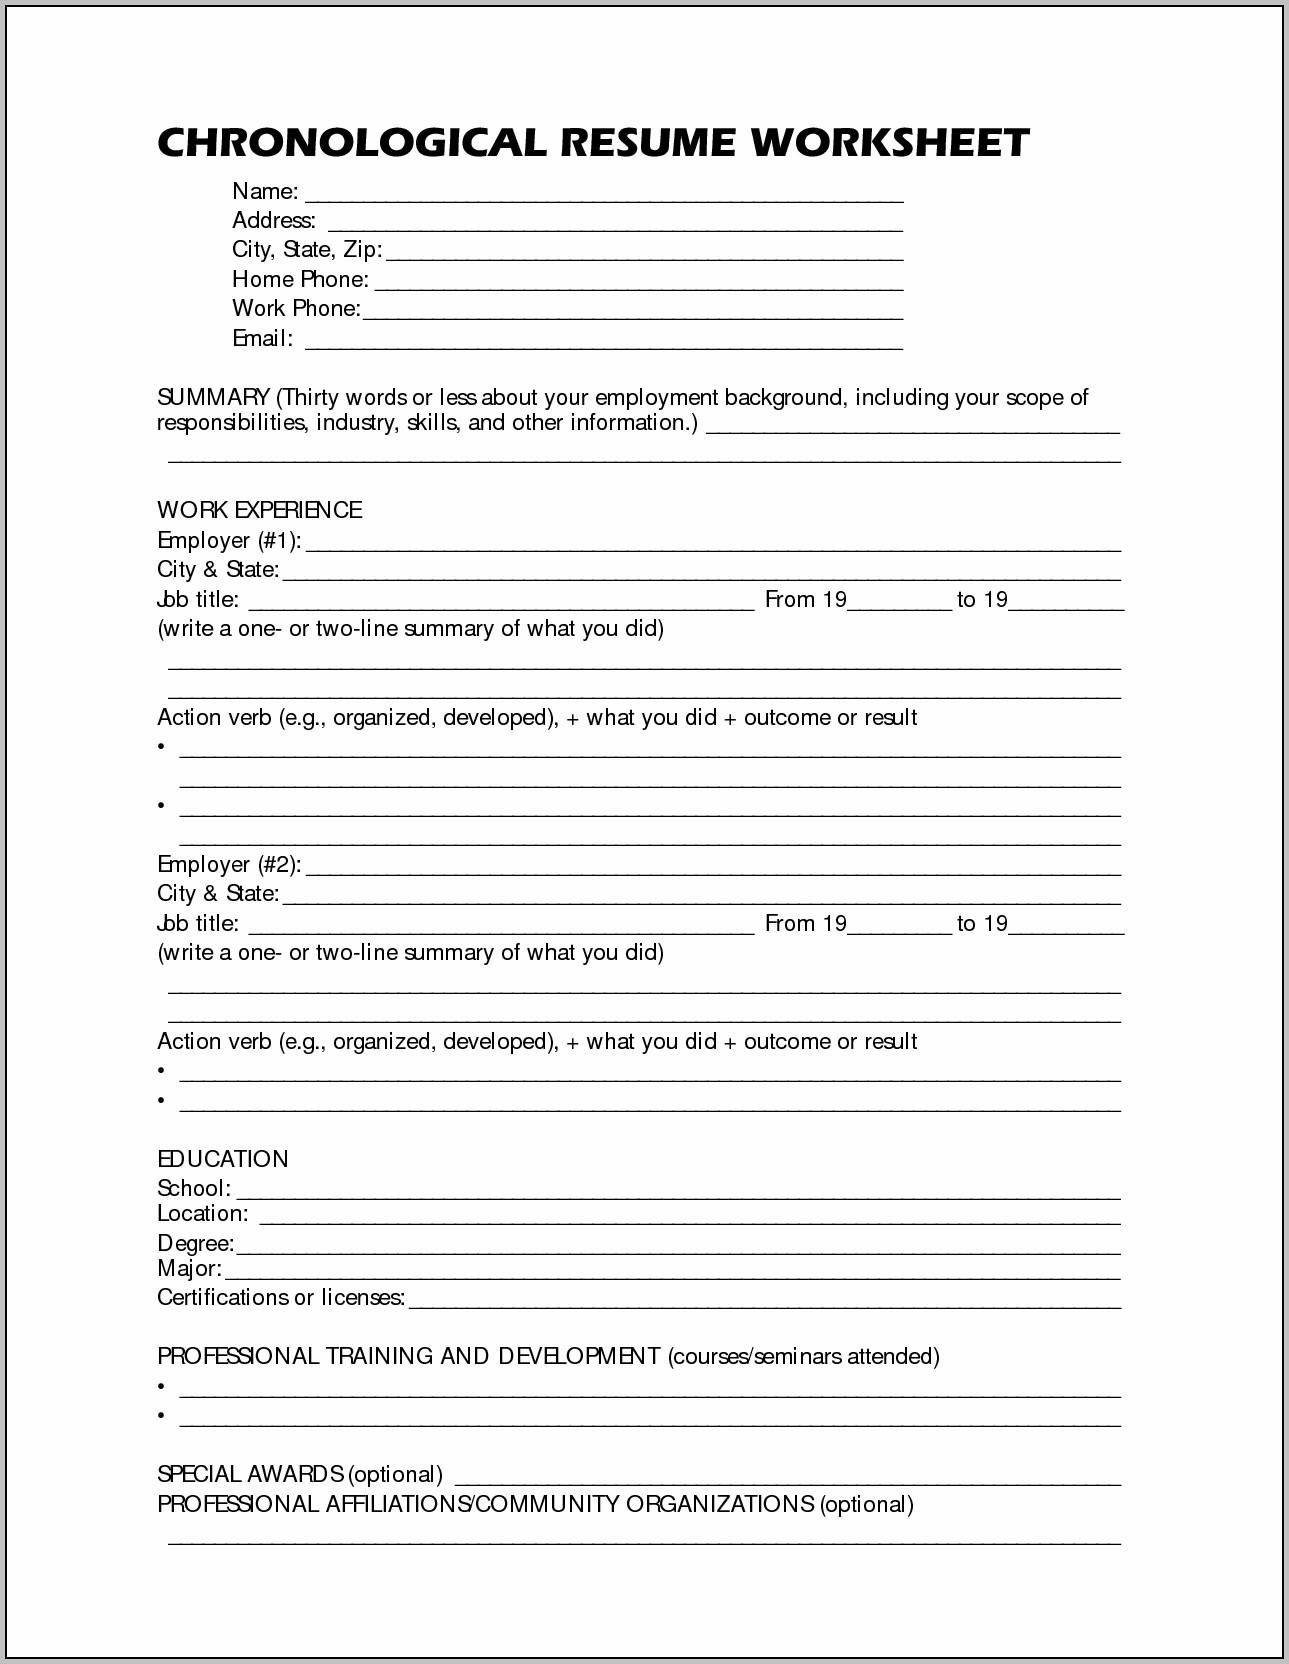 Free Printable Resume Worksheet   Resume : Resume Examples #8PKxvX6kv0